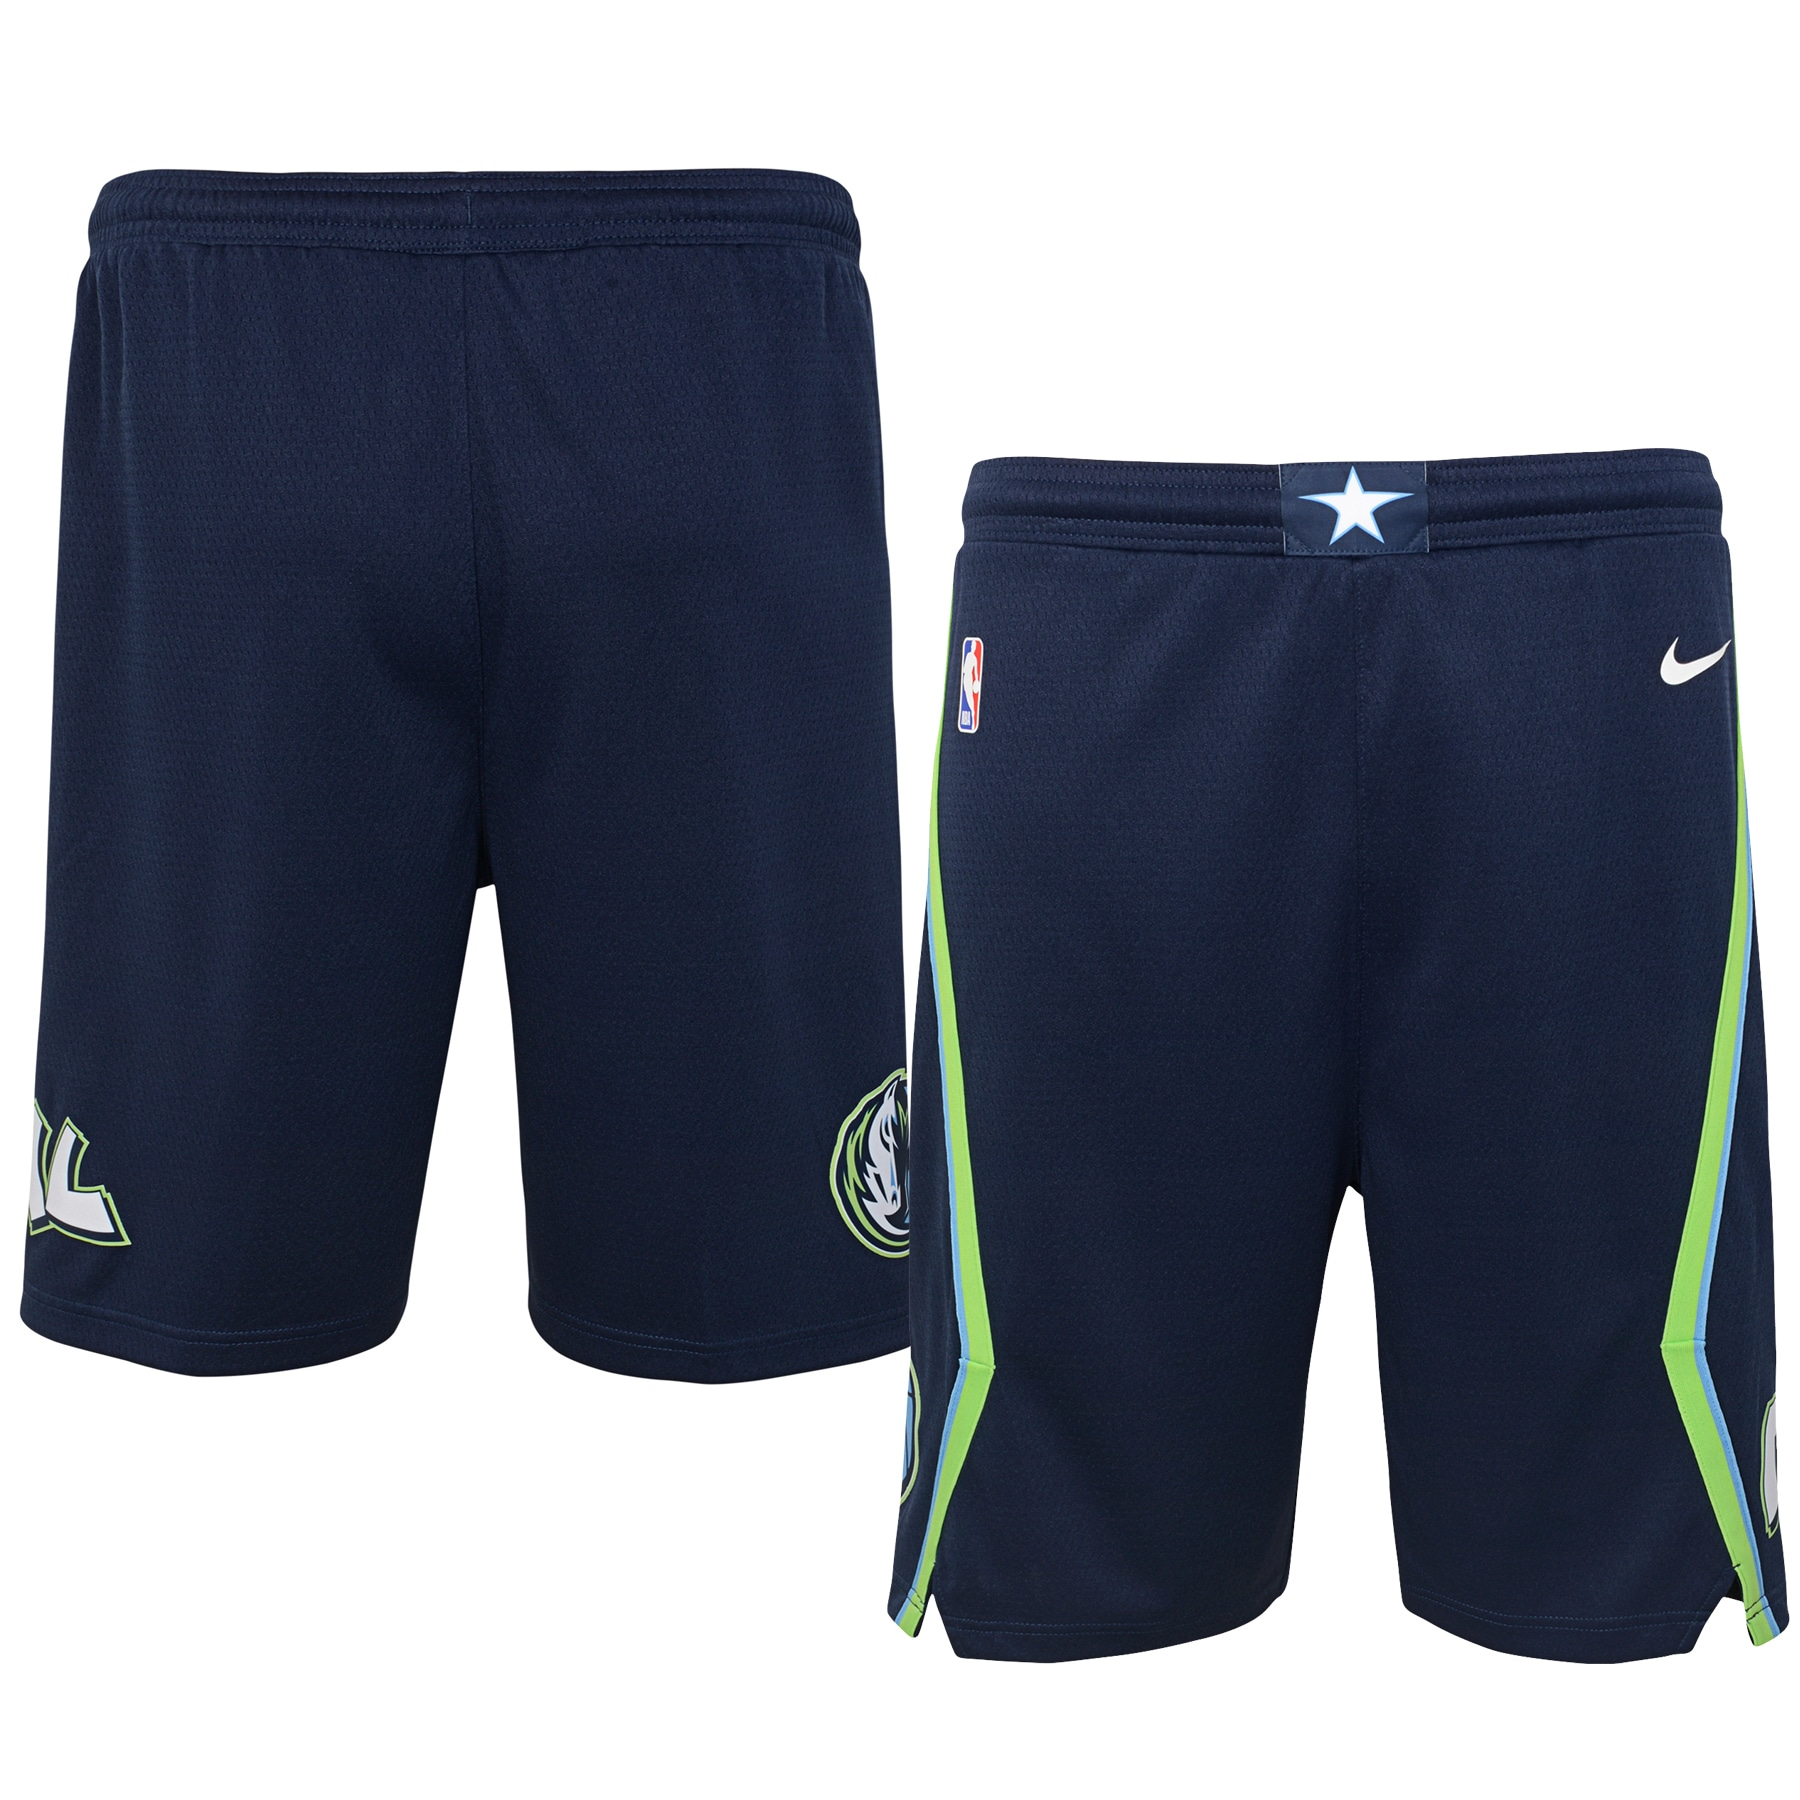 Dallas Mavericks Nike Youth 2019/20 City Edition Swingman Shorts - Blue